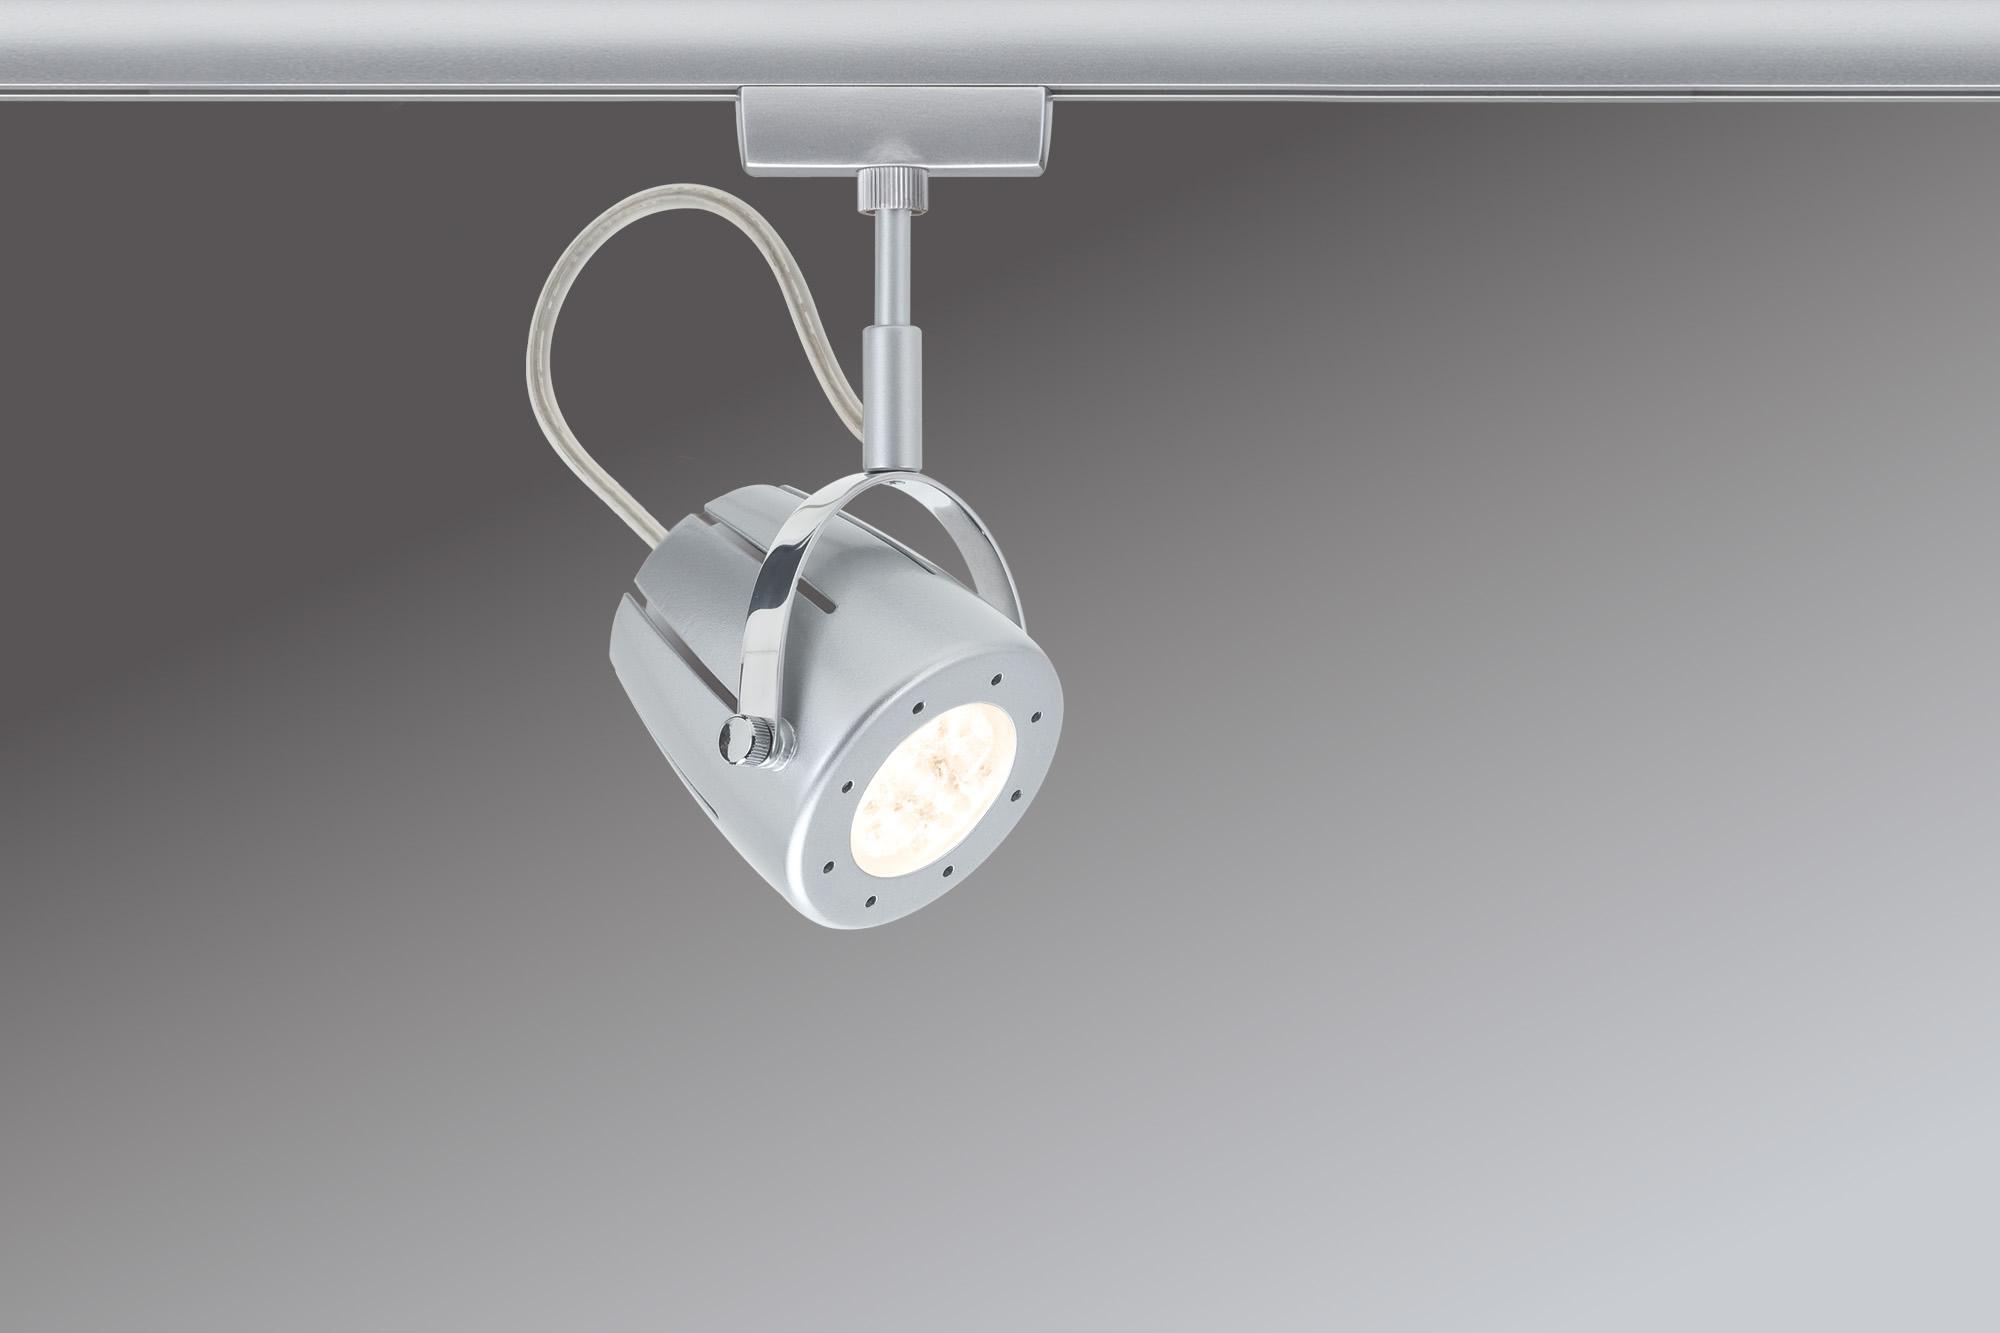 Paulmann. 95121 Св-к URail L&E Spot Mega 1x3,4W GU10 Chr-m